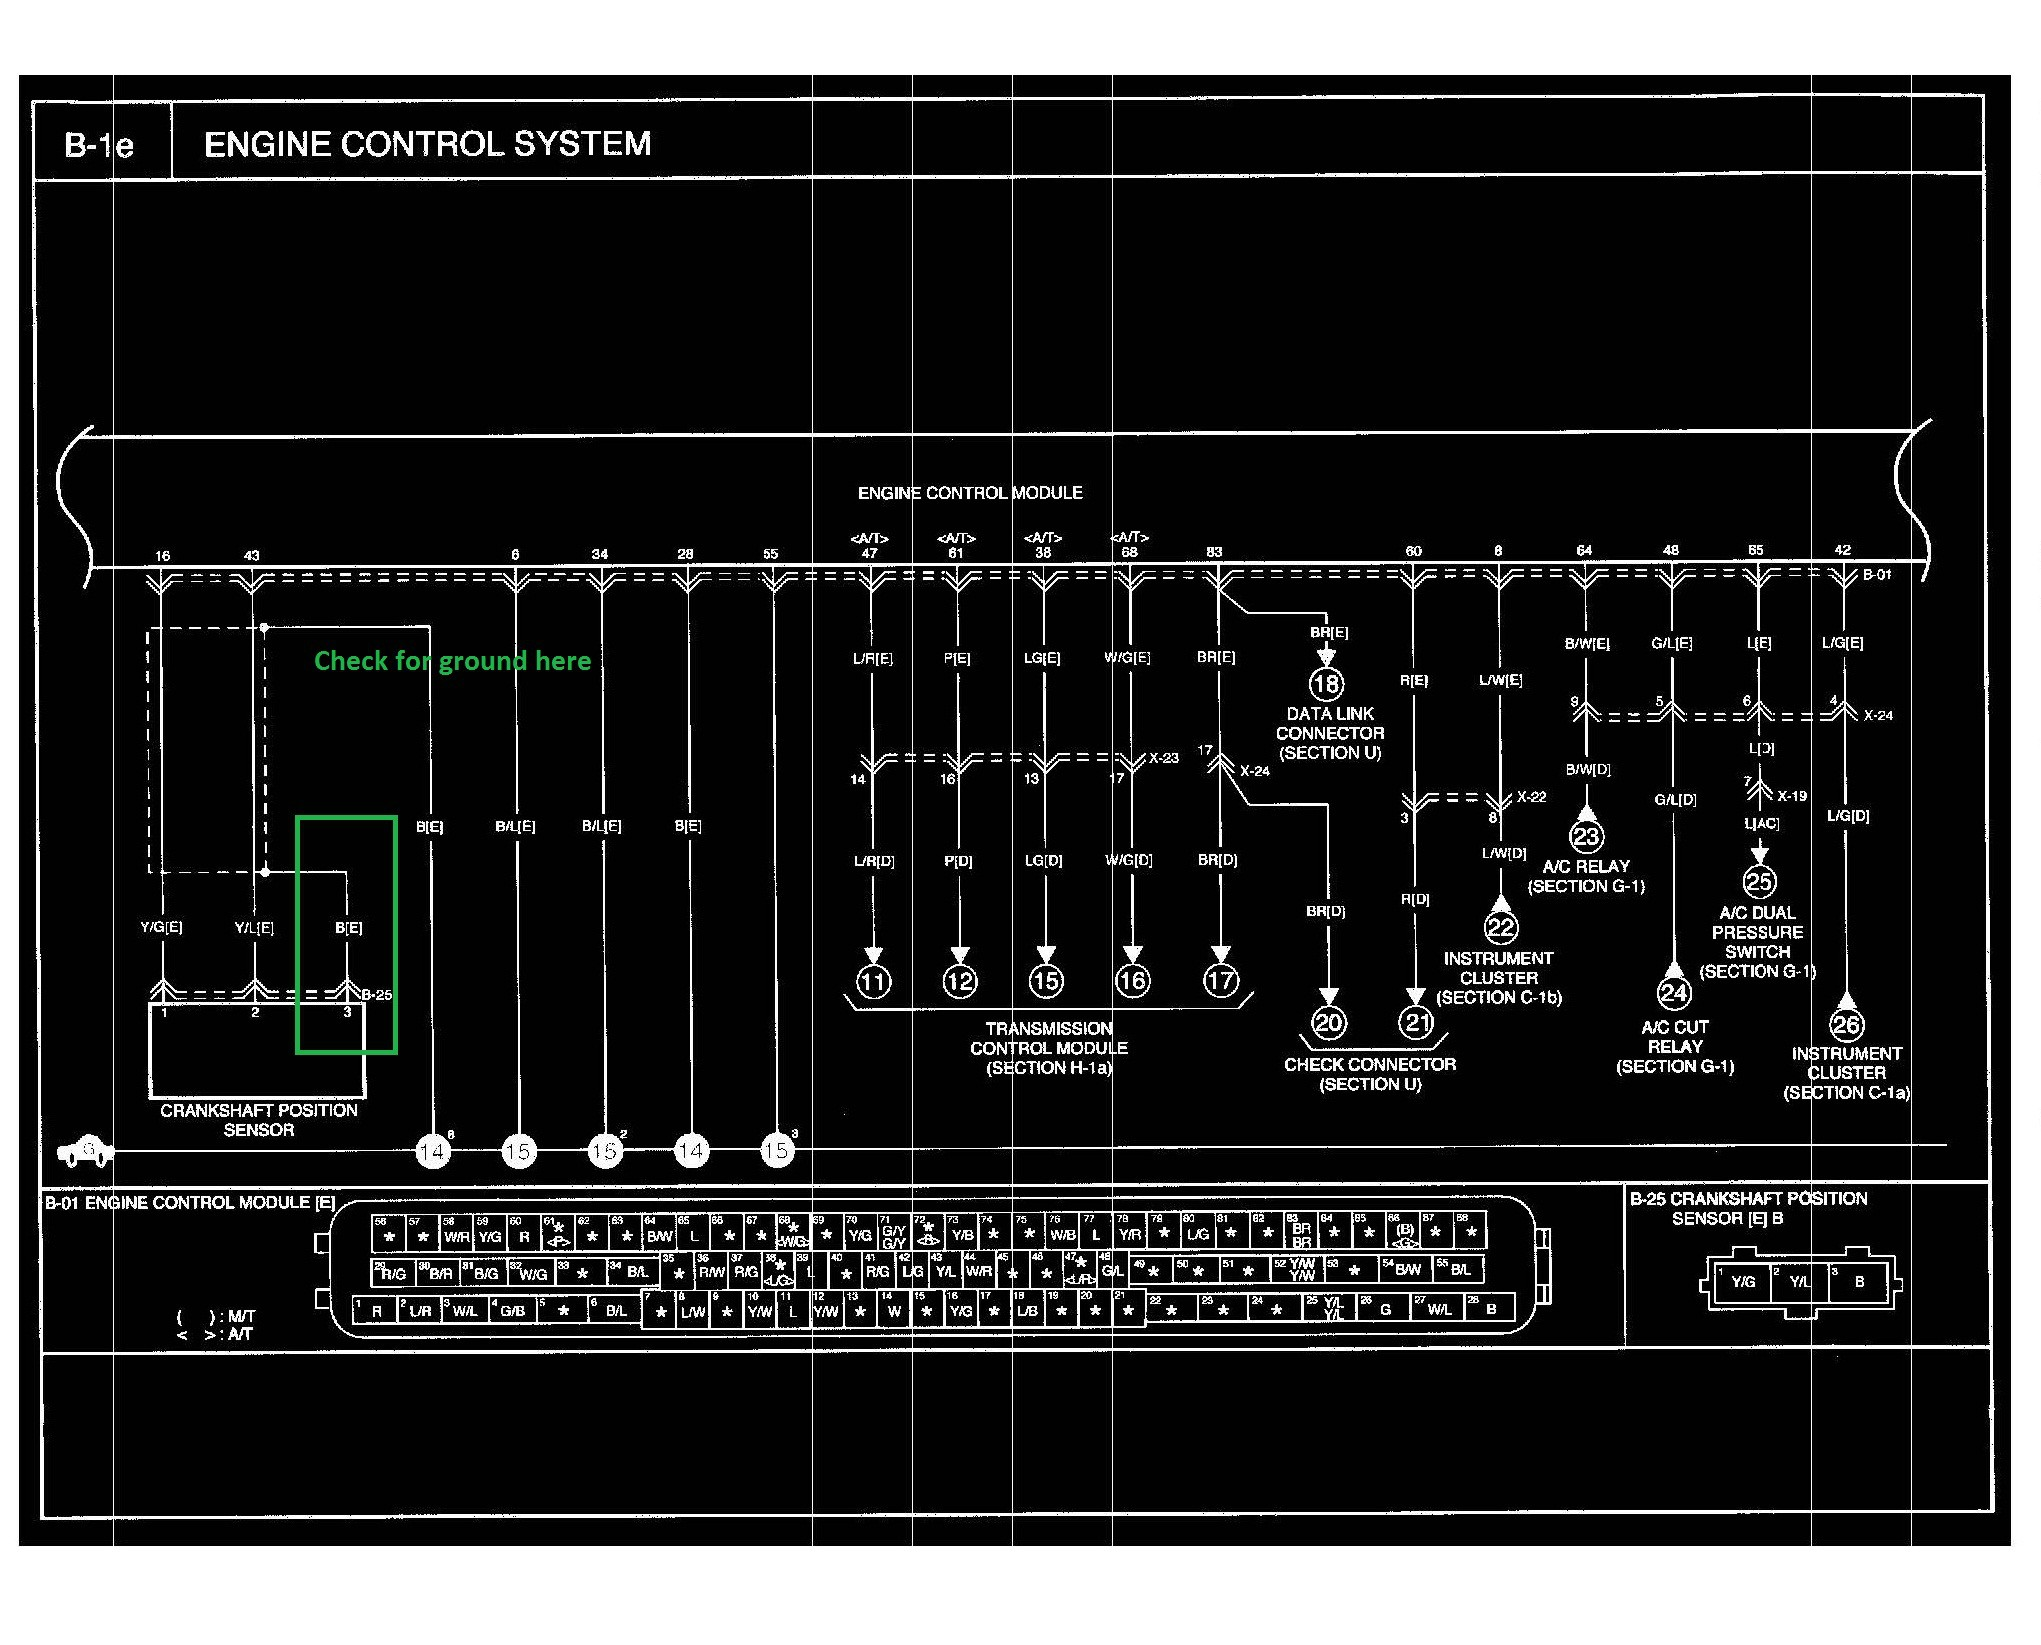 2001 kia sportage fuse box diagram image details 2001 kia sportage fuse box diagram asfbconference2016 Gallery